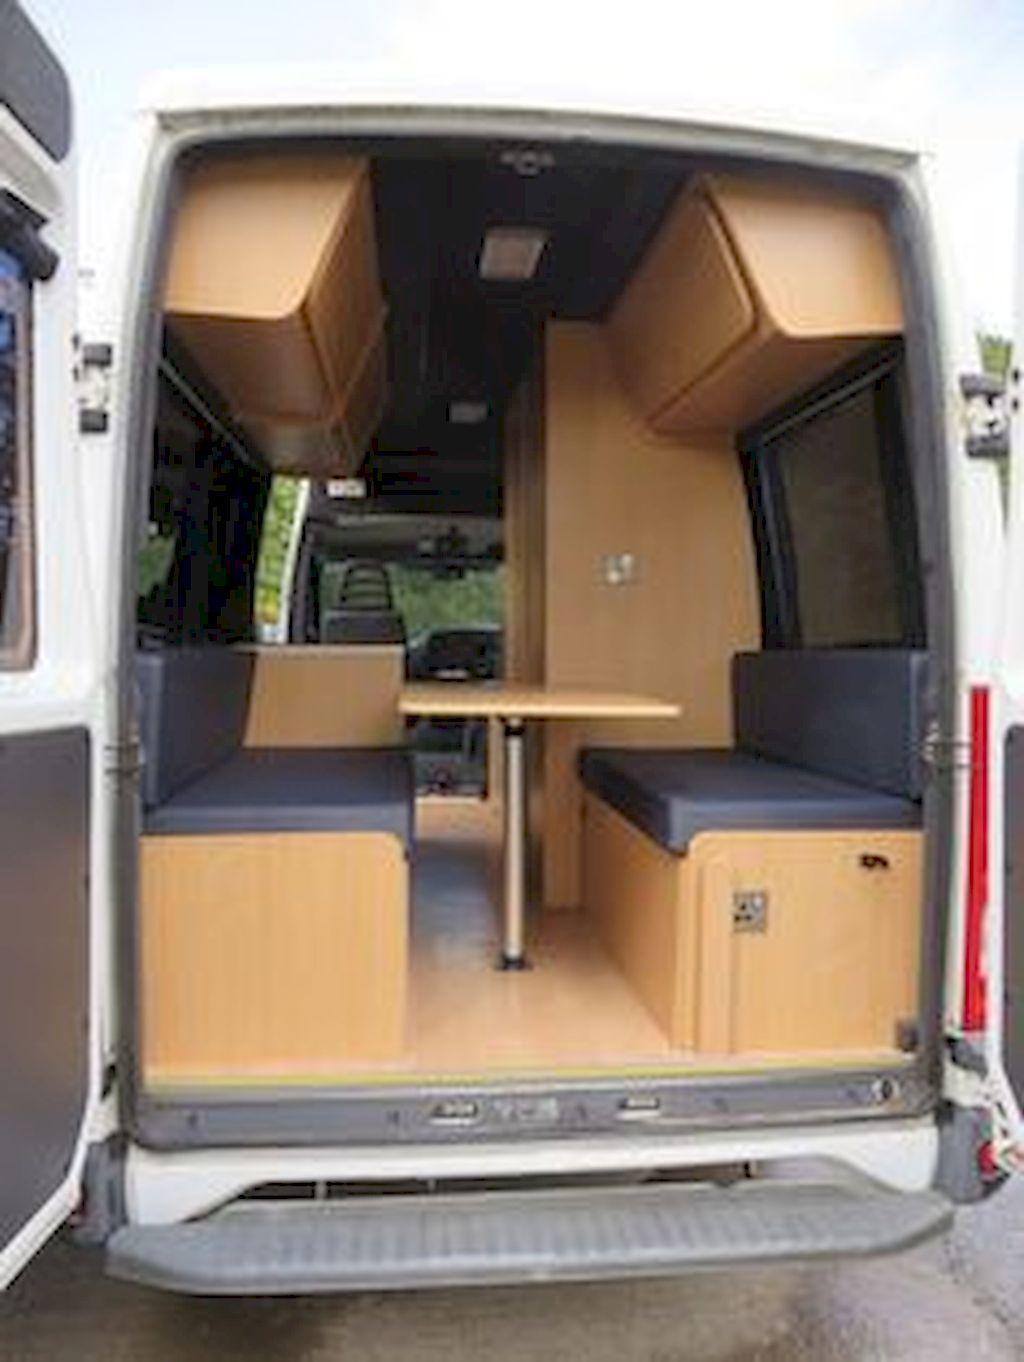 Cool 95 DIY Camper Van Conversion For Road Trip Vacation Roomodeling Diy